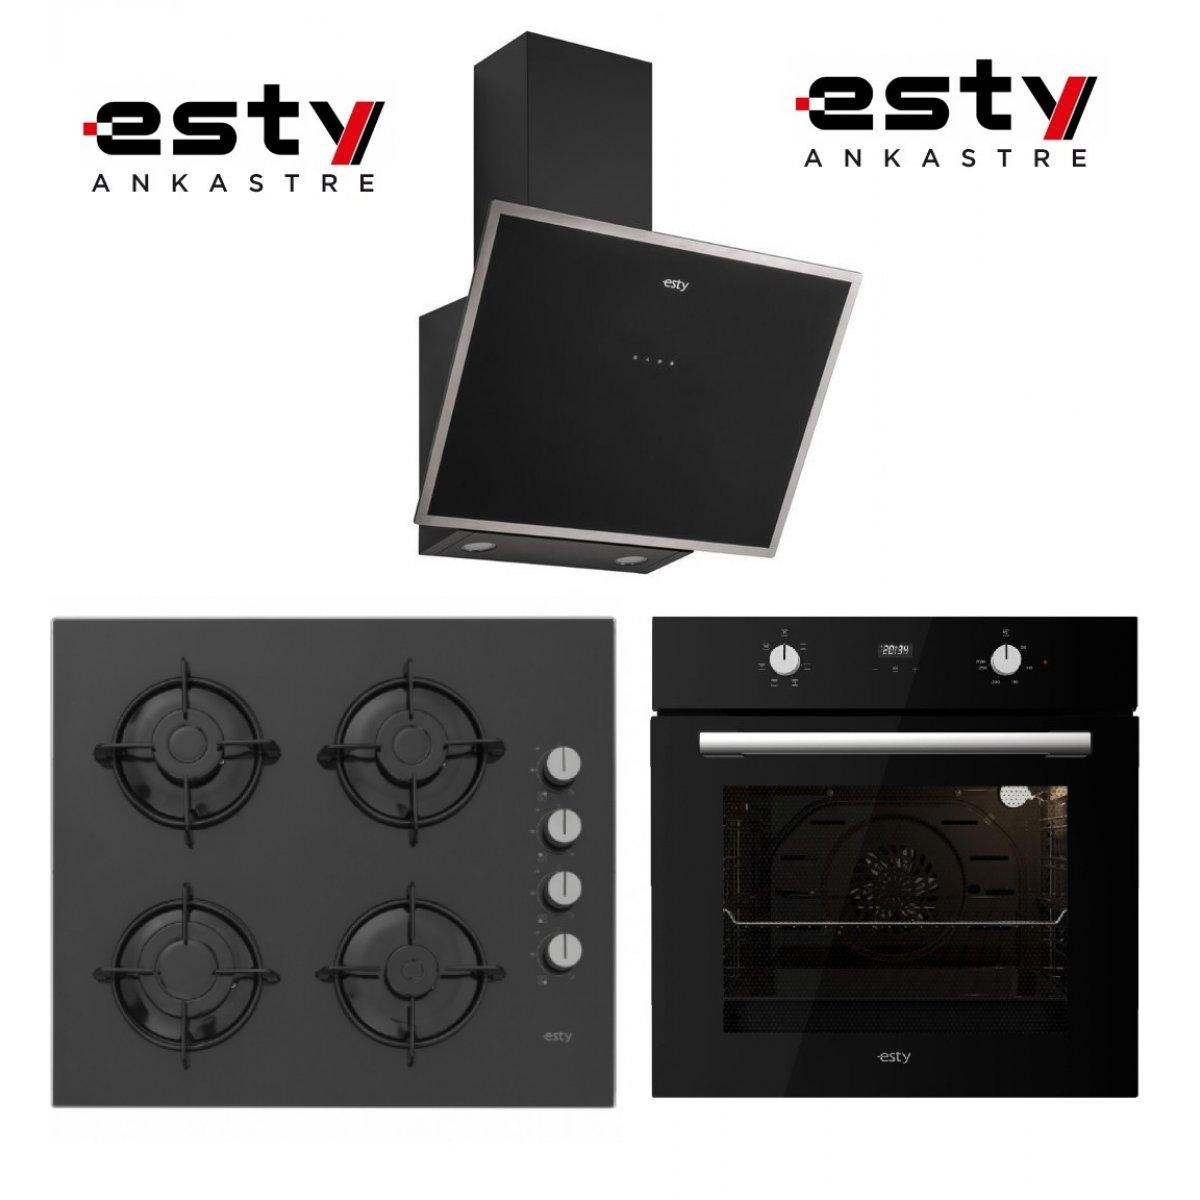 Esty Ankastre Set 9 ( 3473 / ACO5360B01 / AEF6605B01 )